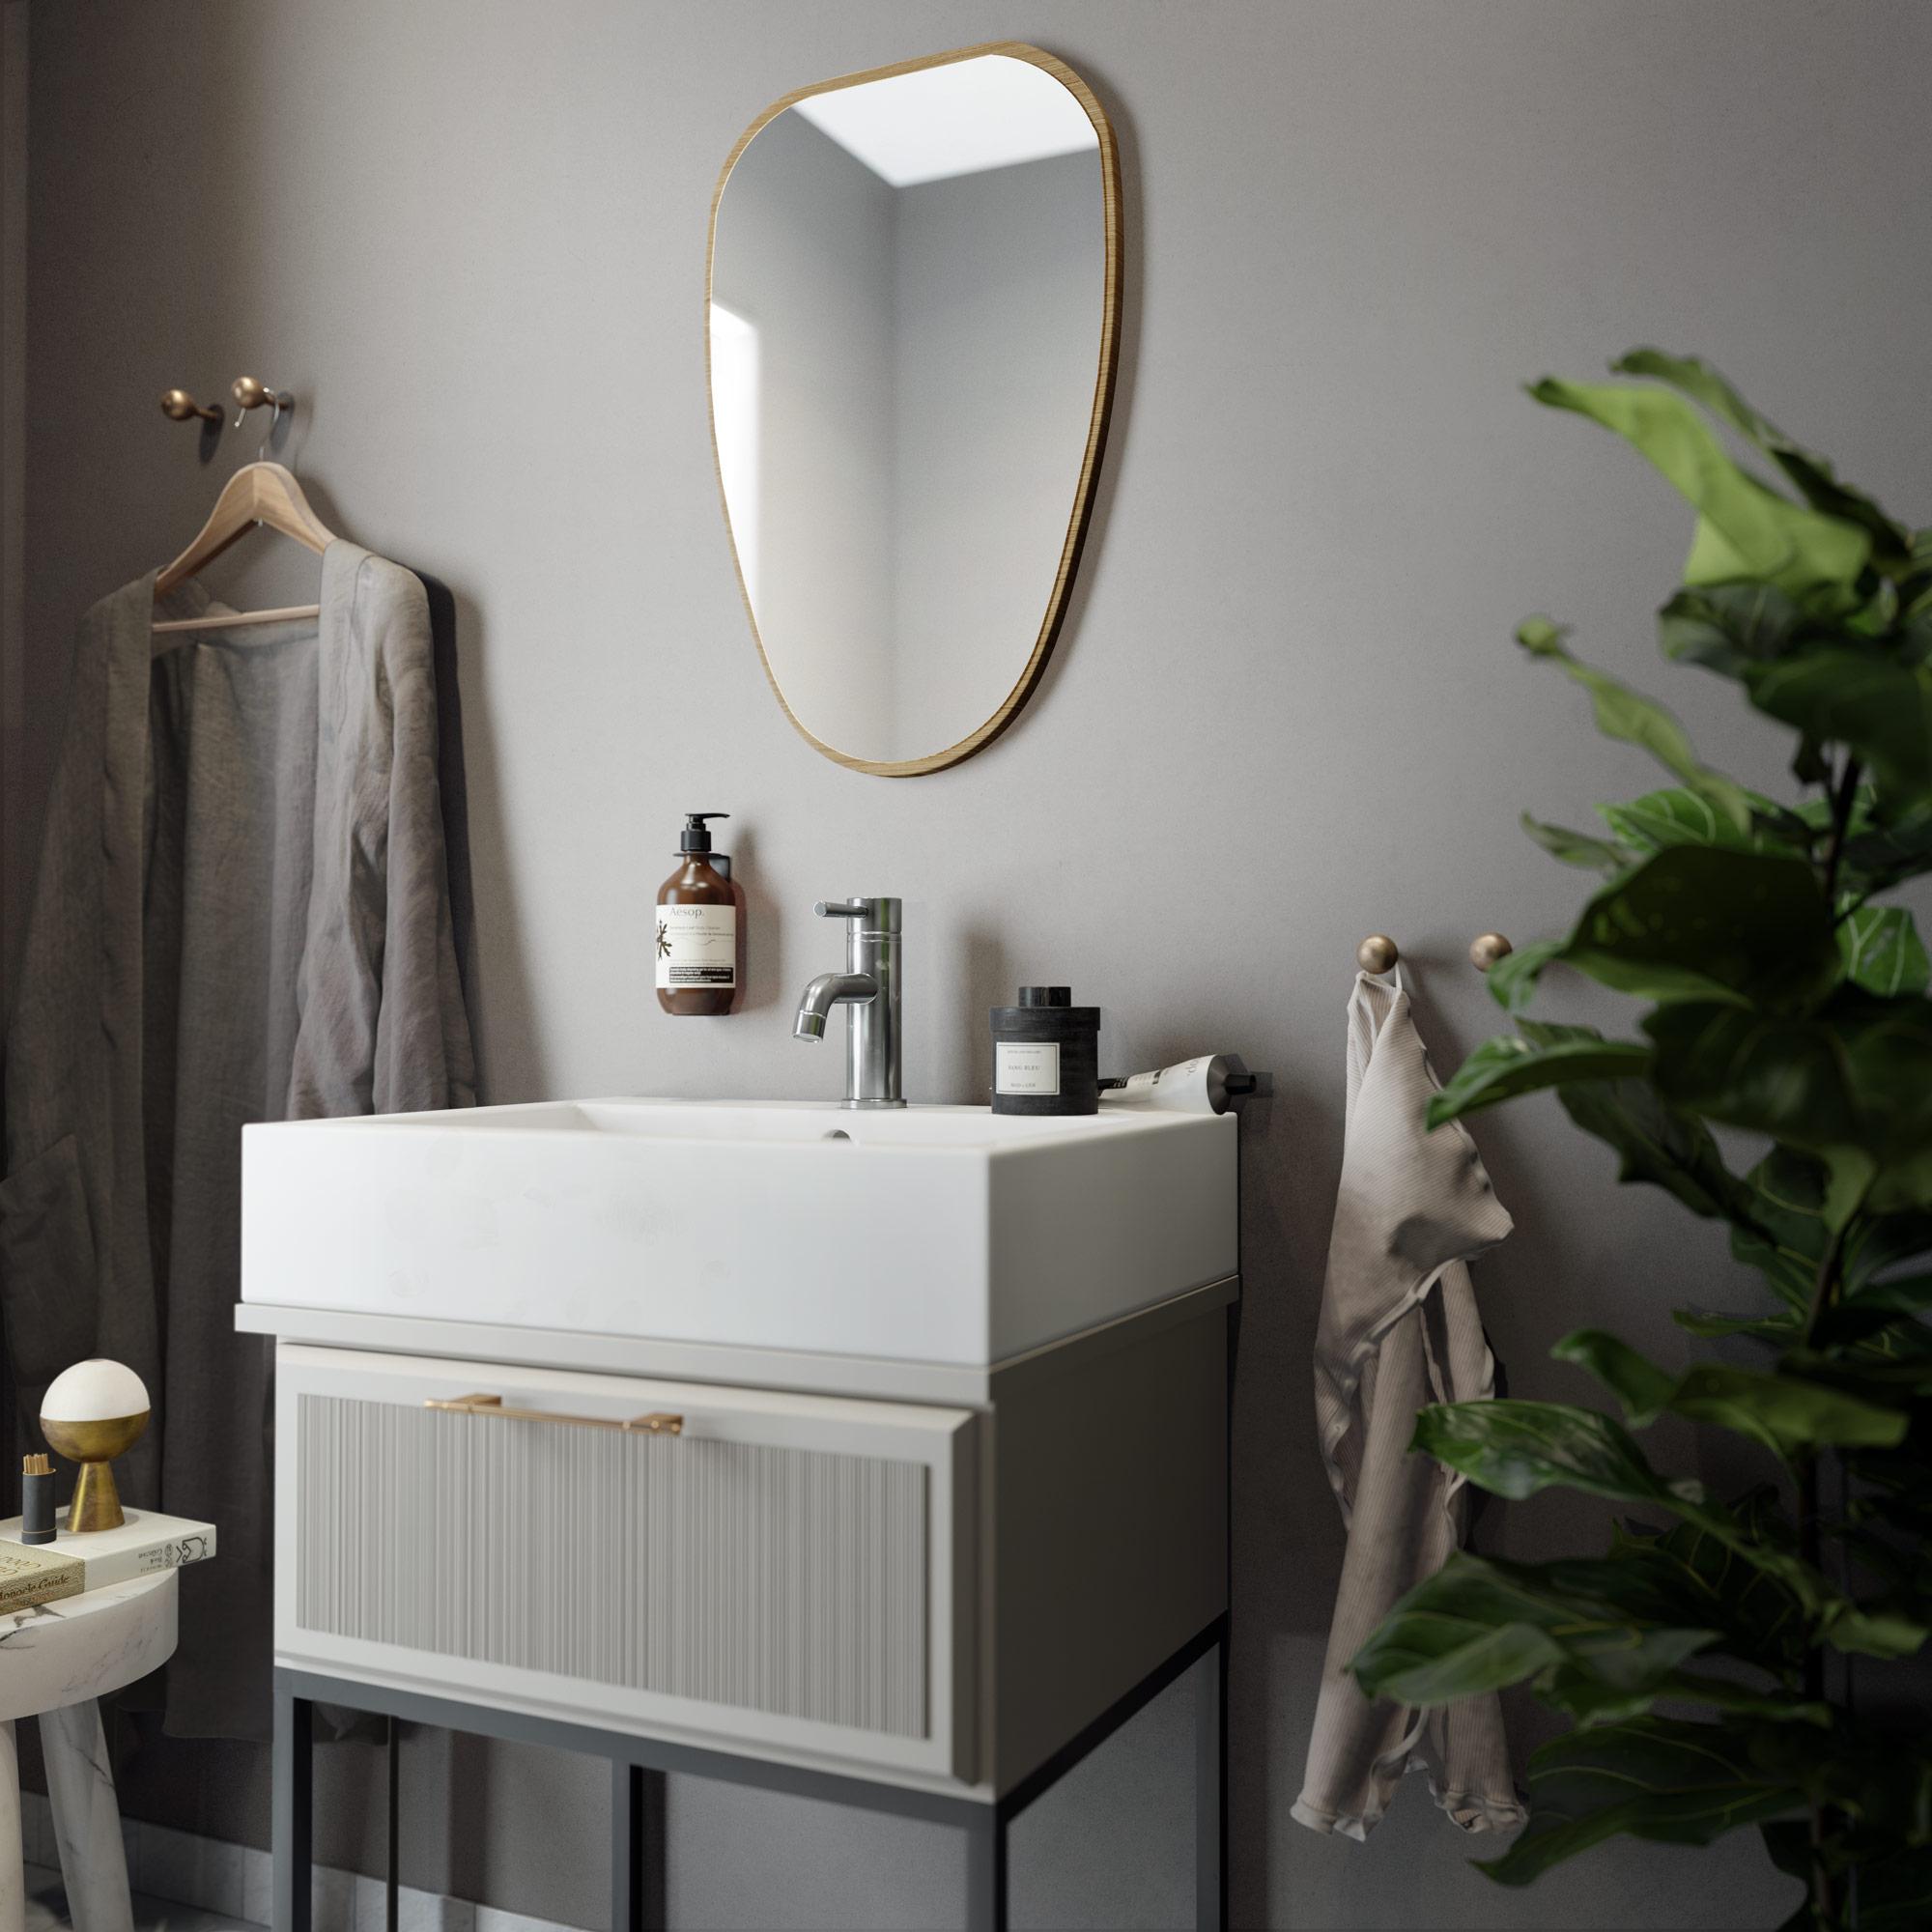 Lenca_Nocks_Bathroom_01.jpg